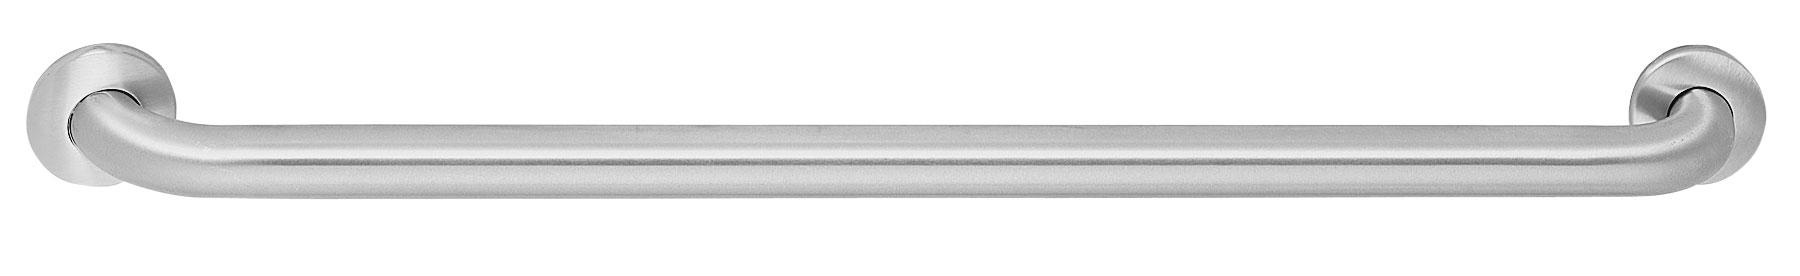 "Bradley 8122-001180 Peened Safety Grip Grab Bar 1-1/2"" OD x 18"""